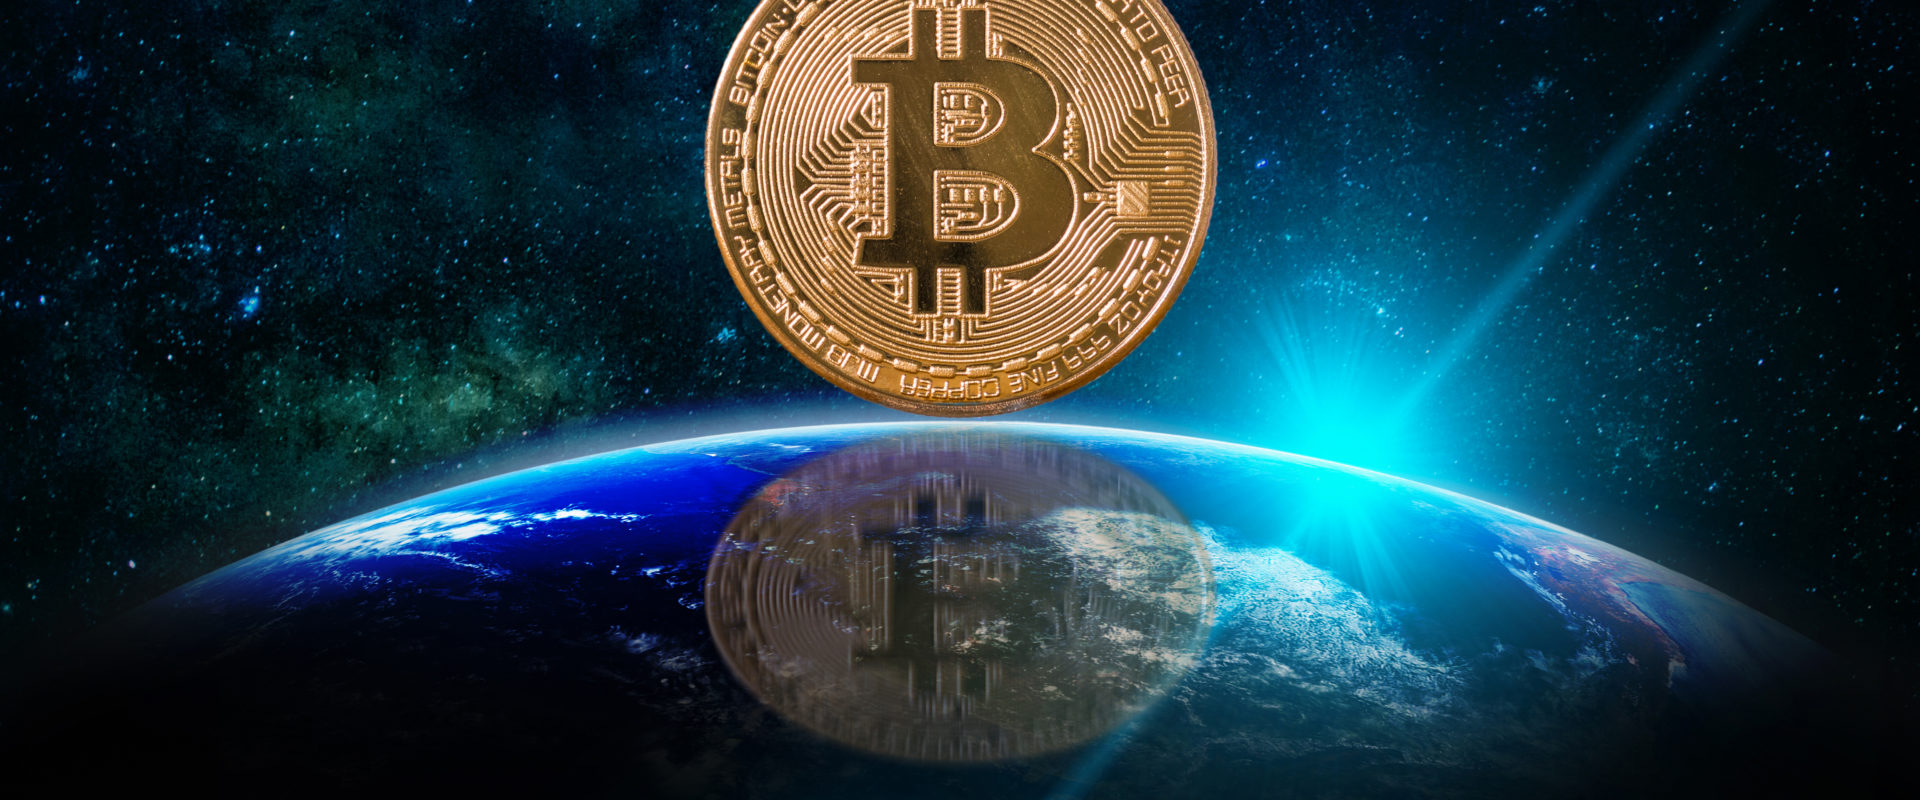 bitcoin btc parabolik